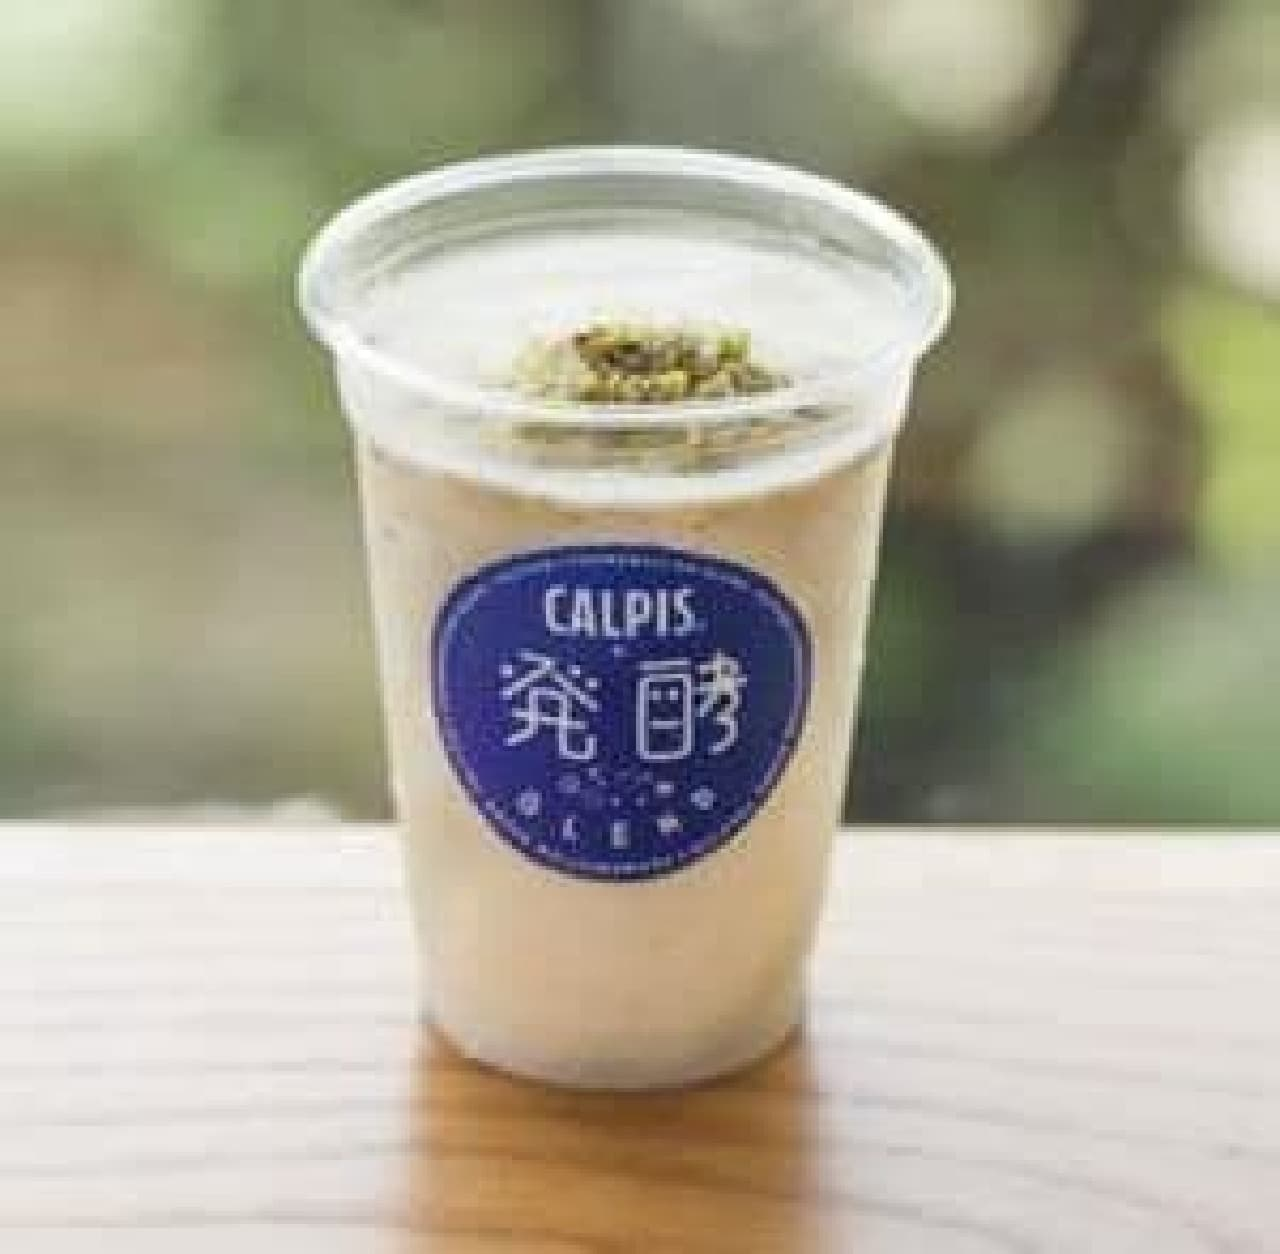 「CALPIS+発酵BLEND」は発酵食品である「カルピス」と代表的な発酵食品がブレンドされたオリジナルドリンク